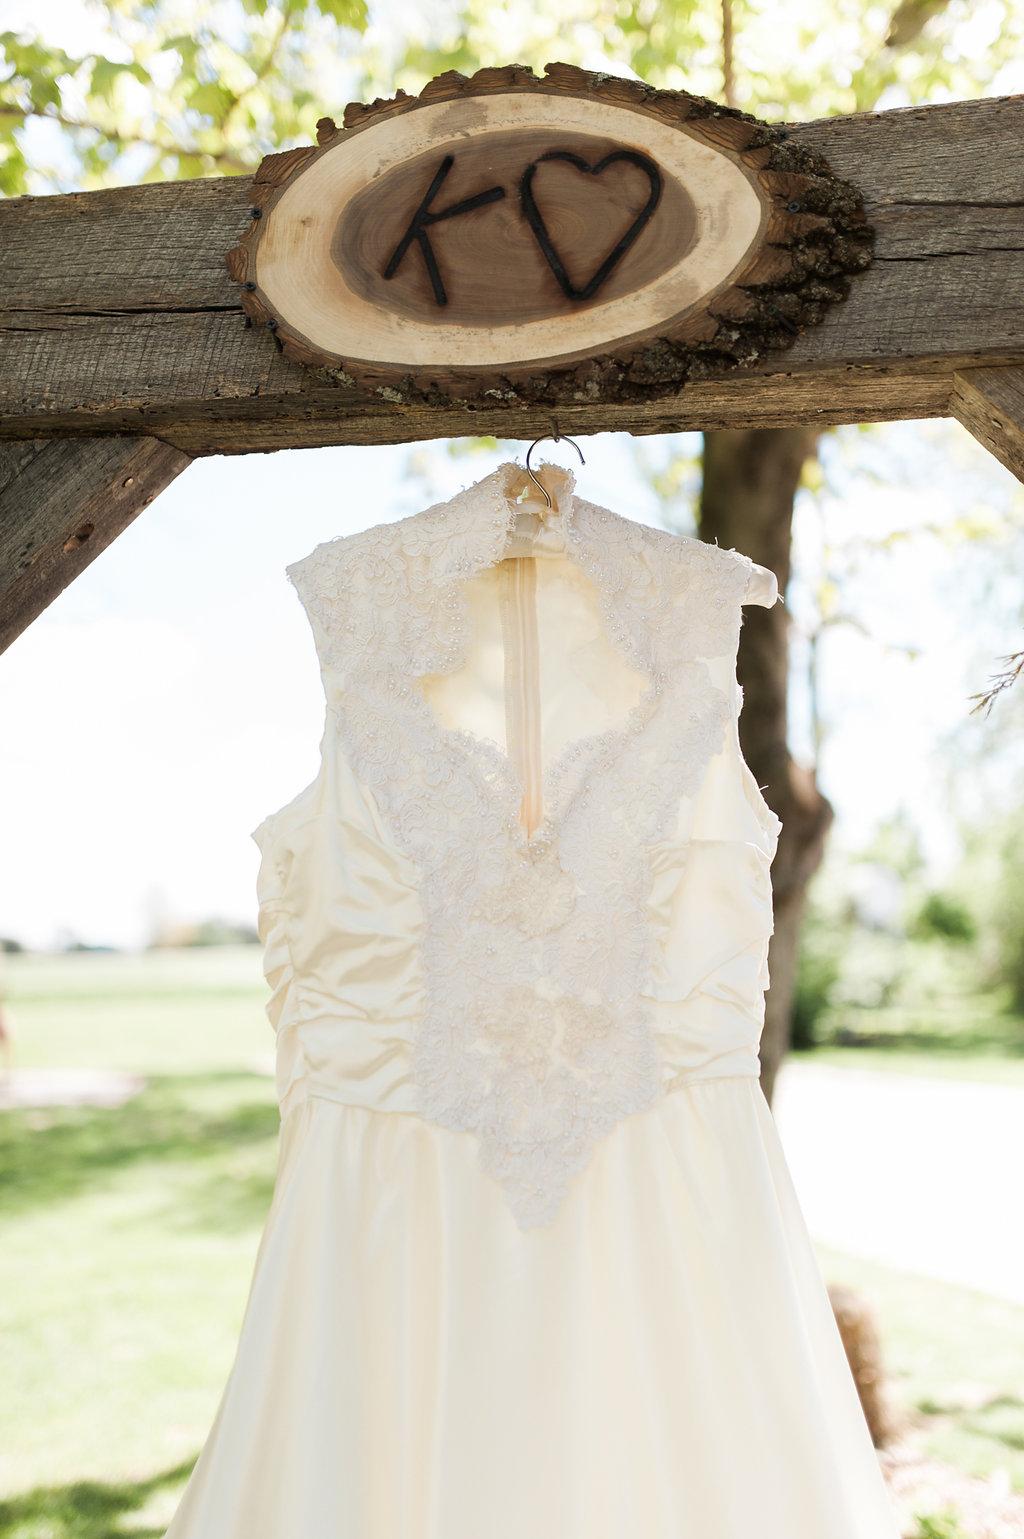 Rustic Wedding Dress - Iowa Farm Wedding - Private Estate Weddings